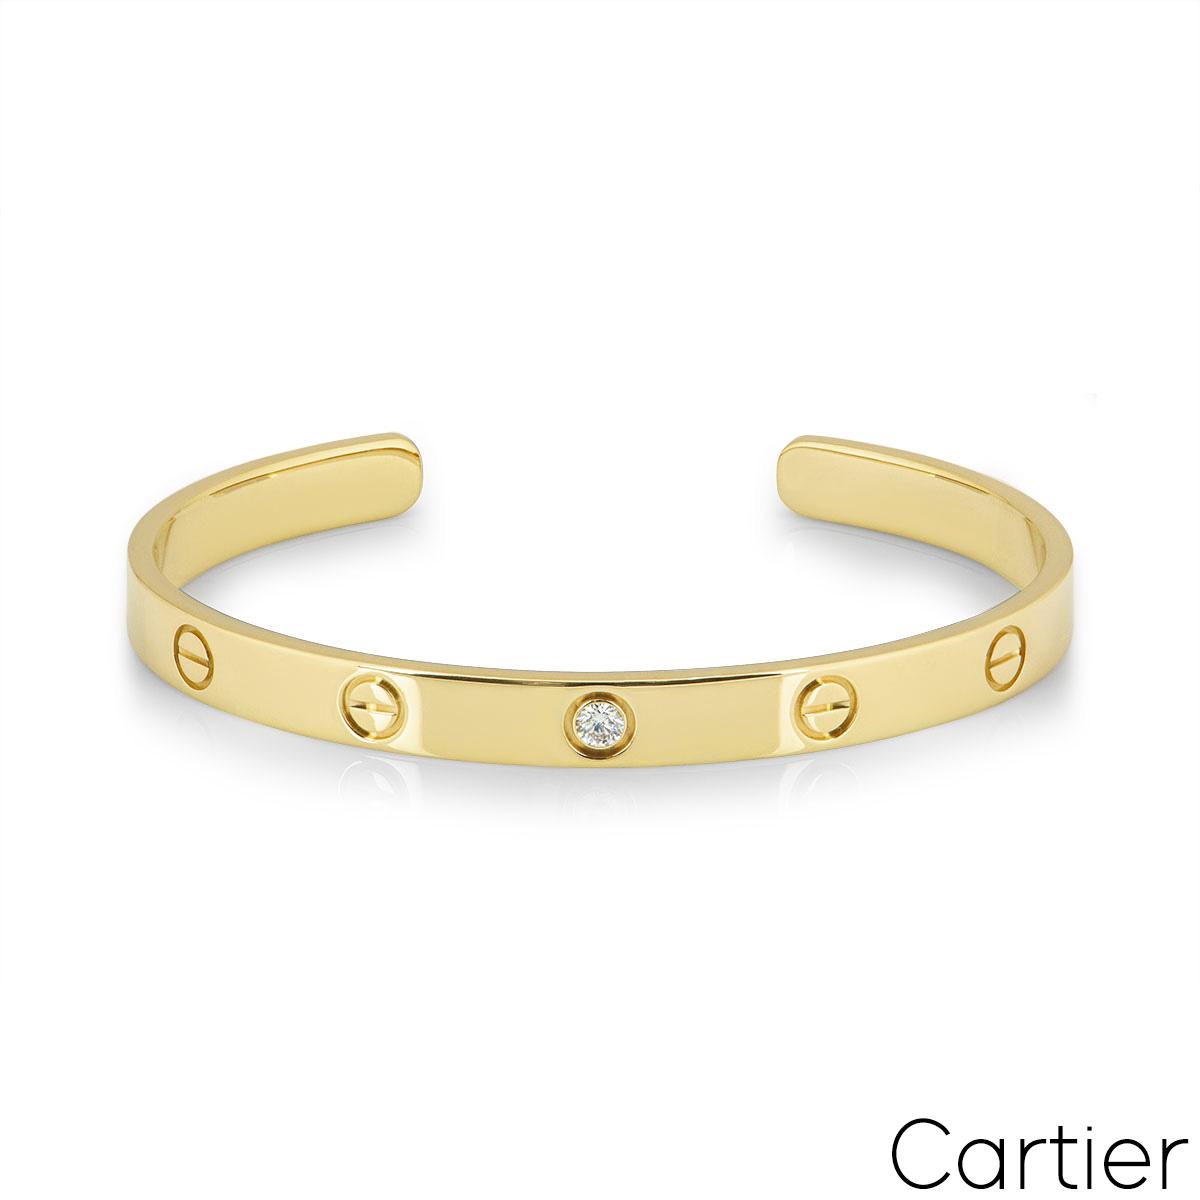 Cartier Yellow Gold Diamond Love Cuff Bracelet Size 16 B6029816